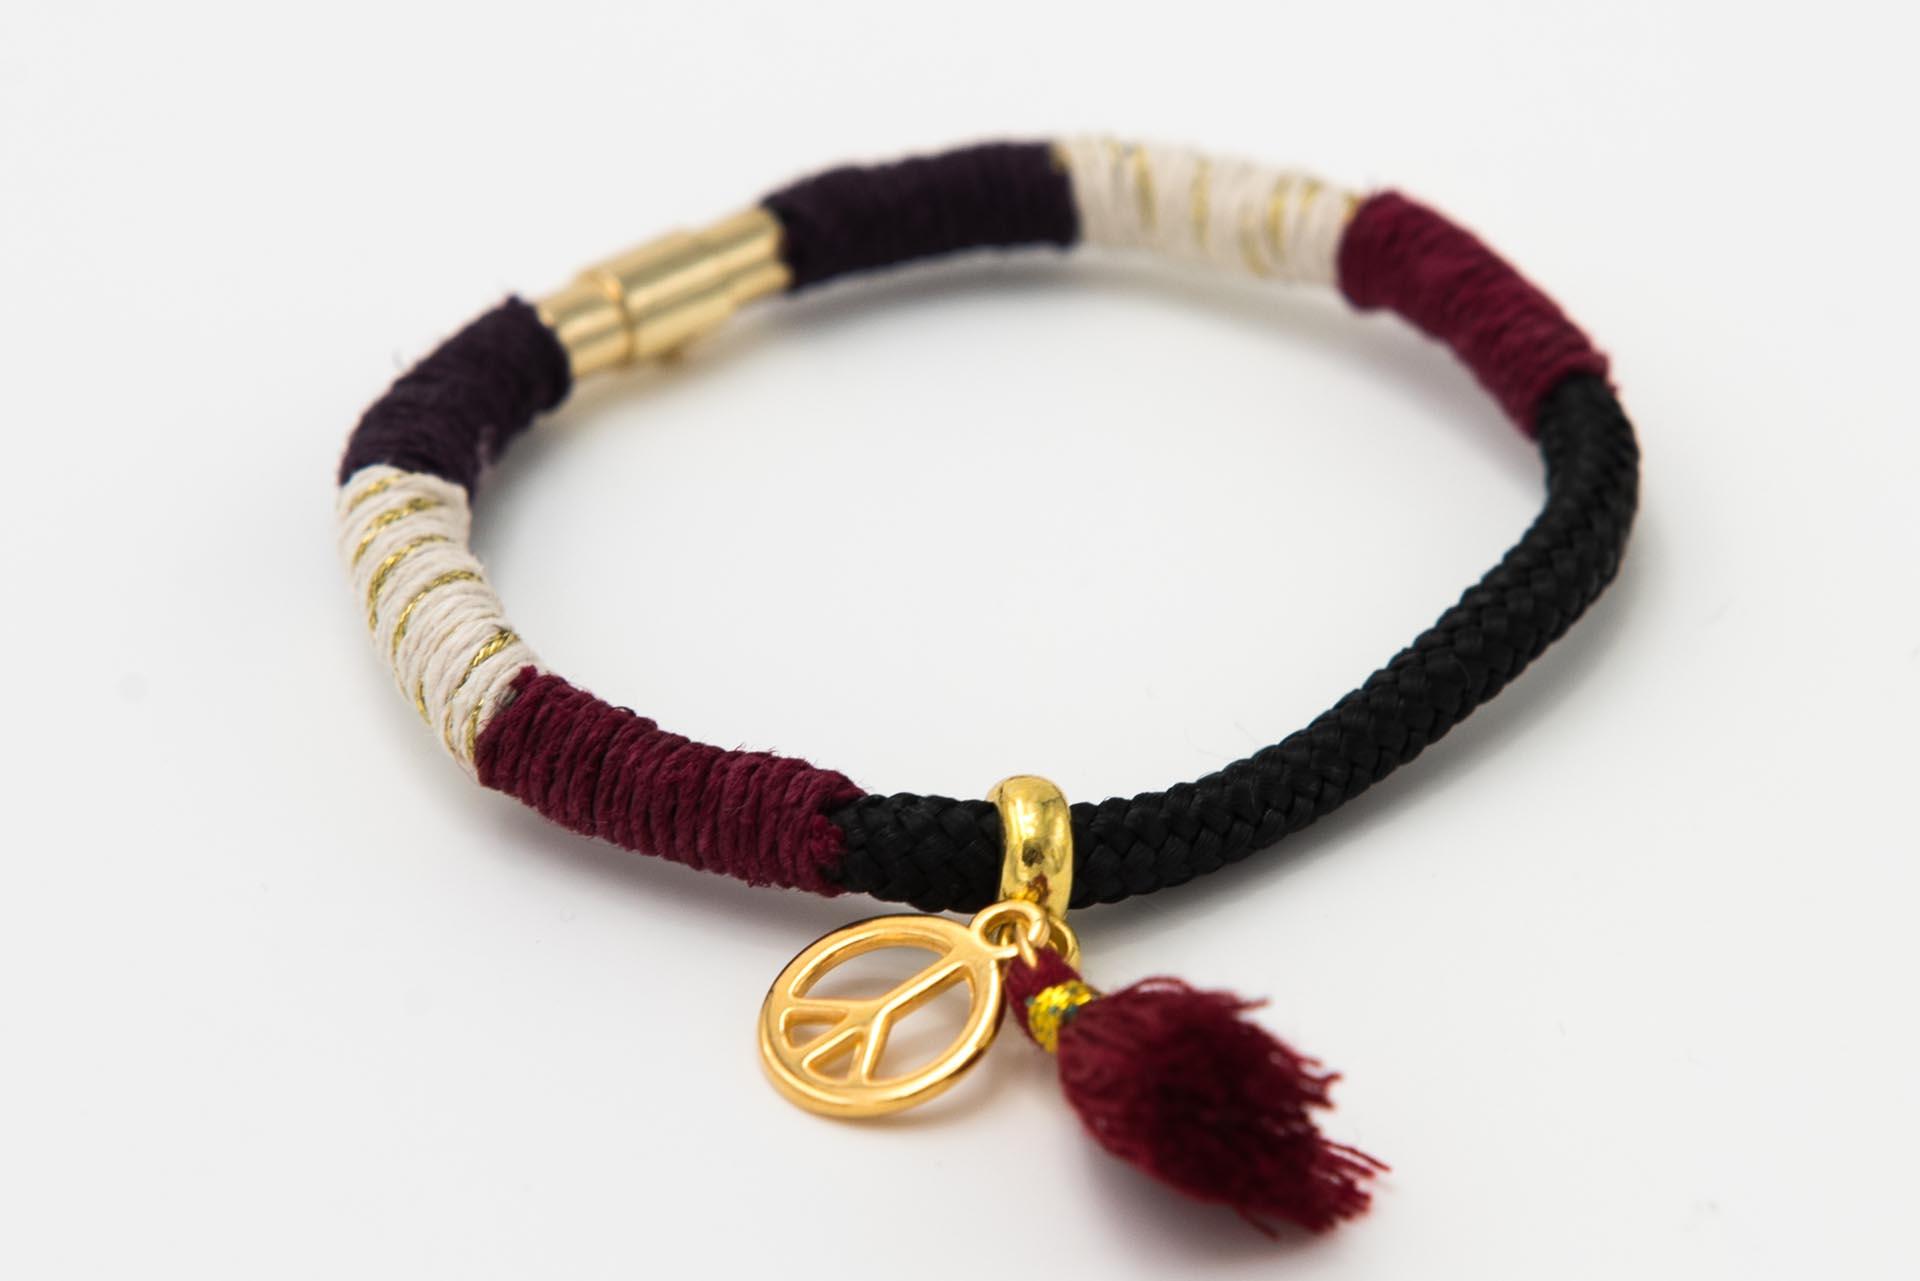 Armband-schwarz-gold-metallic-burgunder-plum